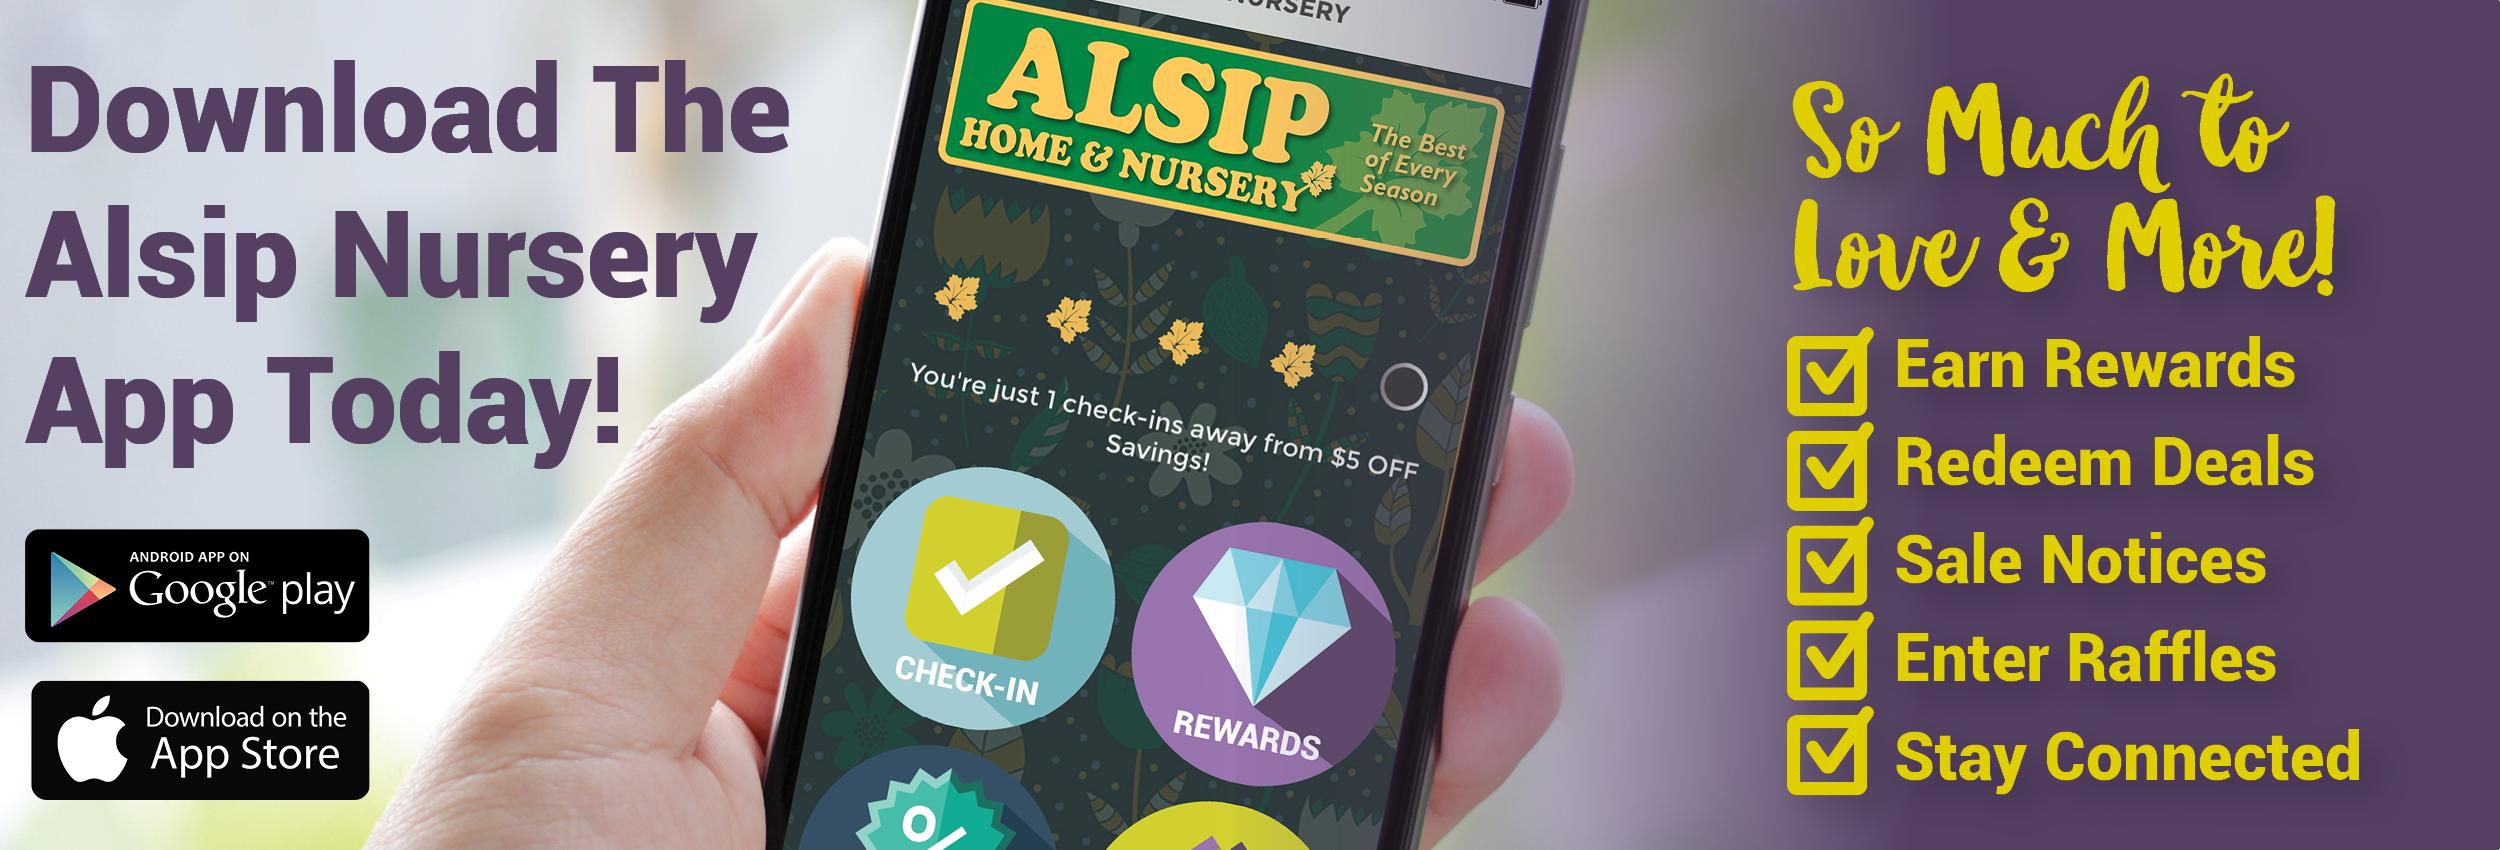 Download the Alsip Nursery App!